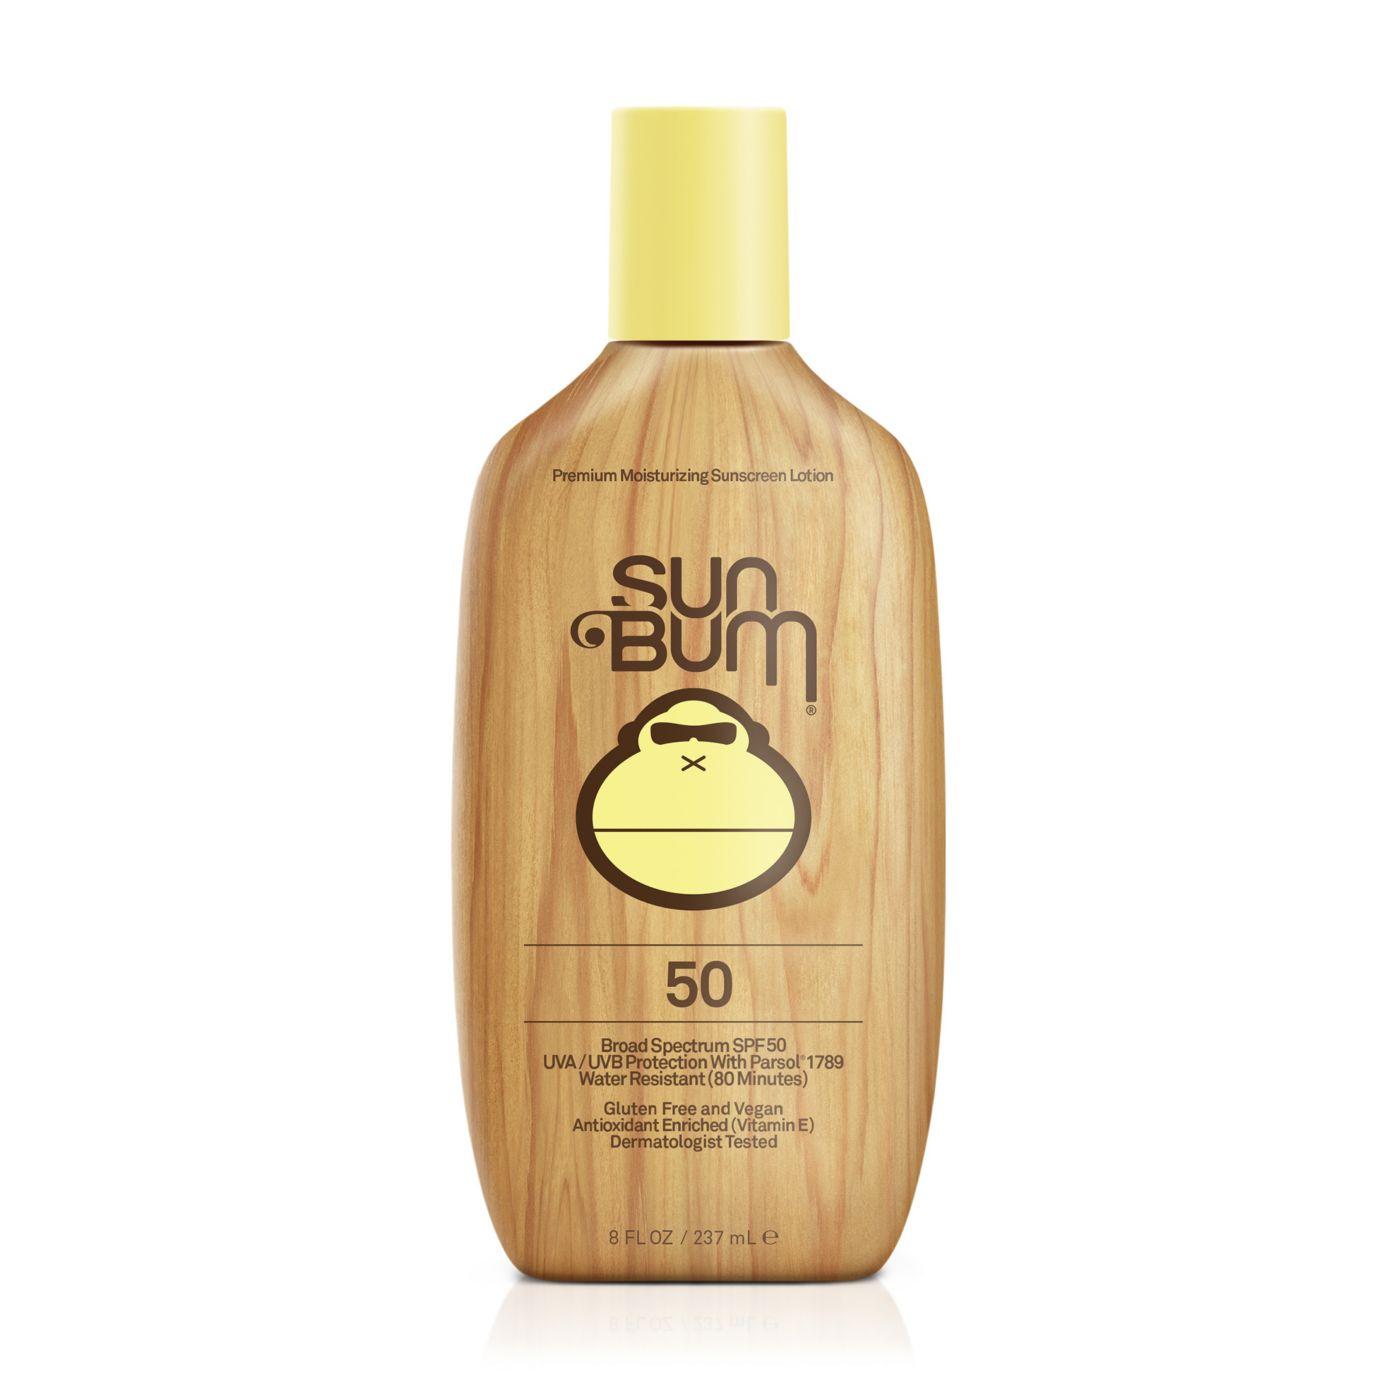 Sun Bum Original SPF 50 Sunscreen Lotion